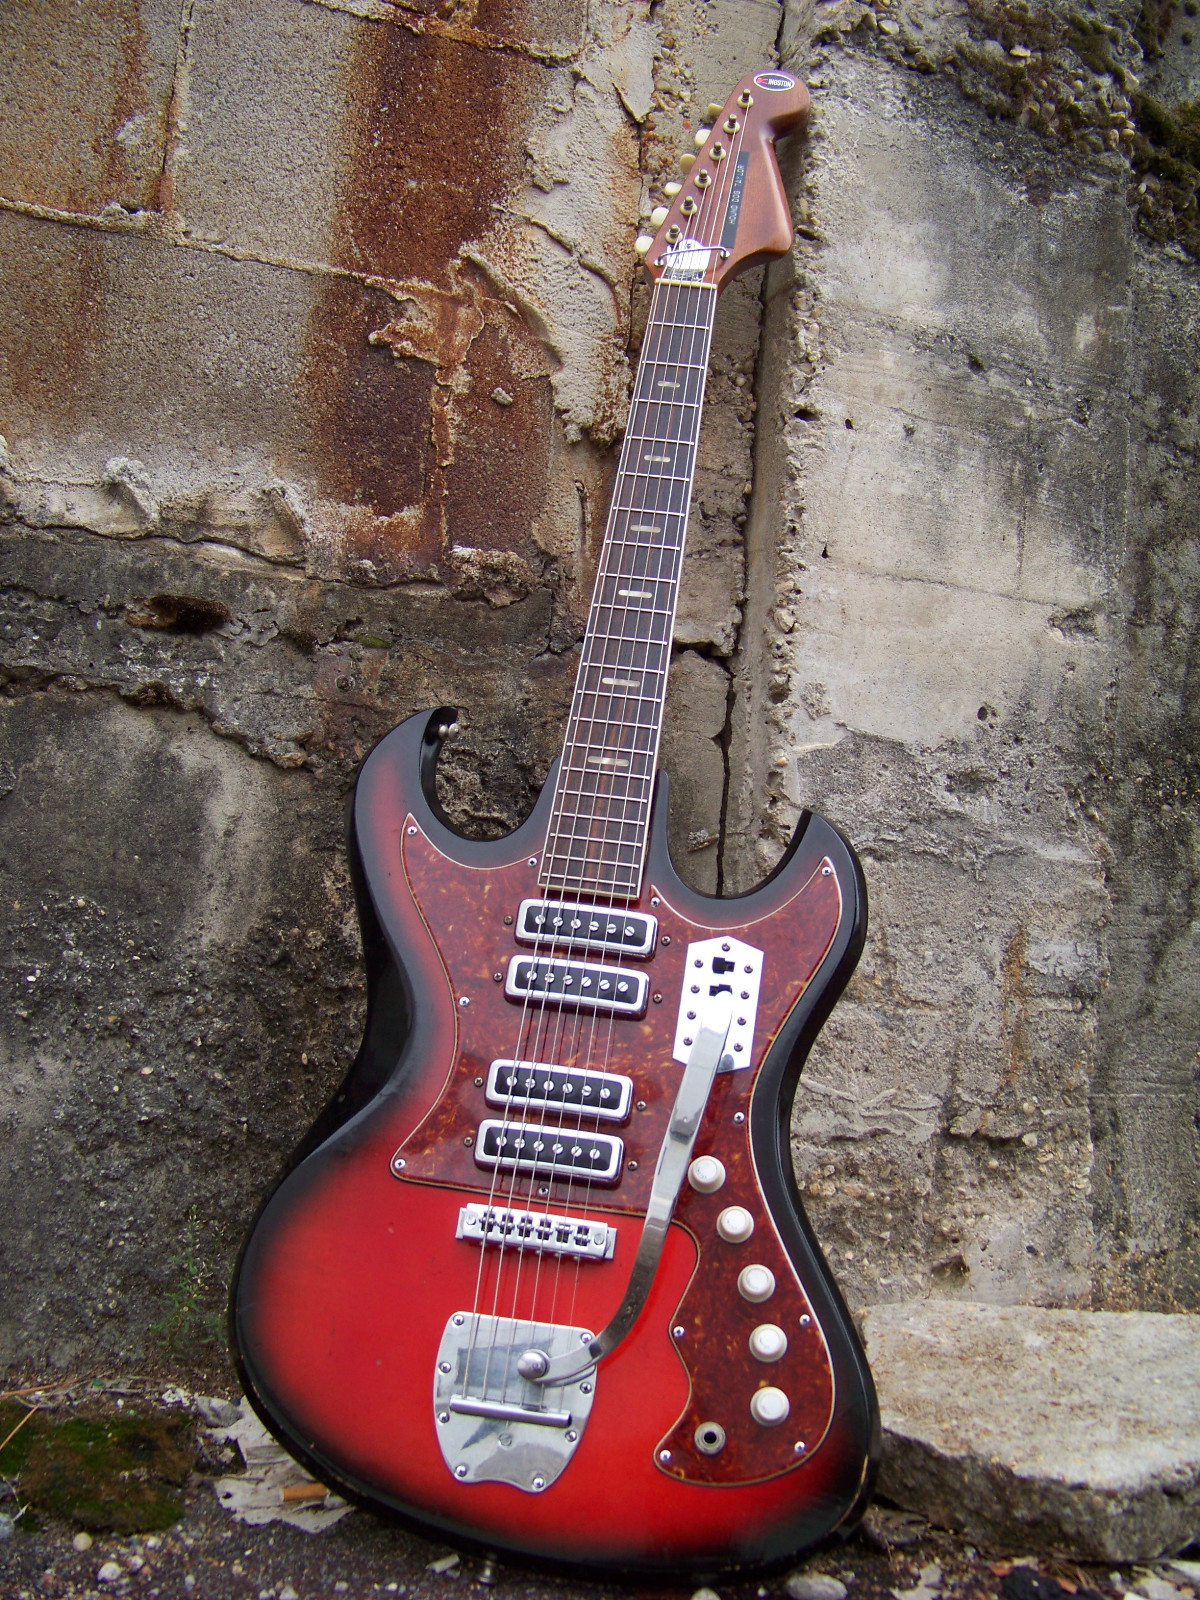 the genuine hound dog taylor kawai teisco electric guitar [ 1200 x 1600 Pixel ]